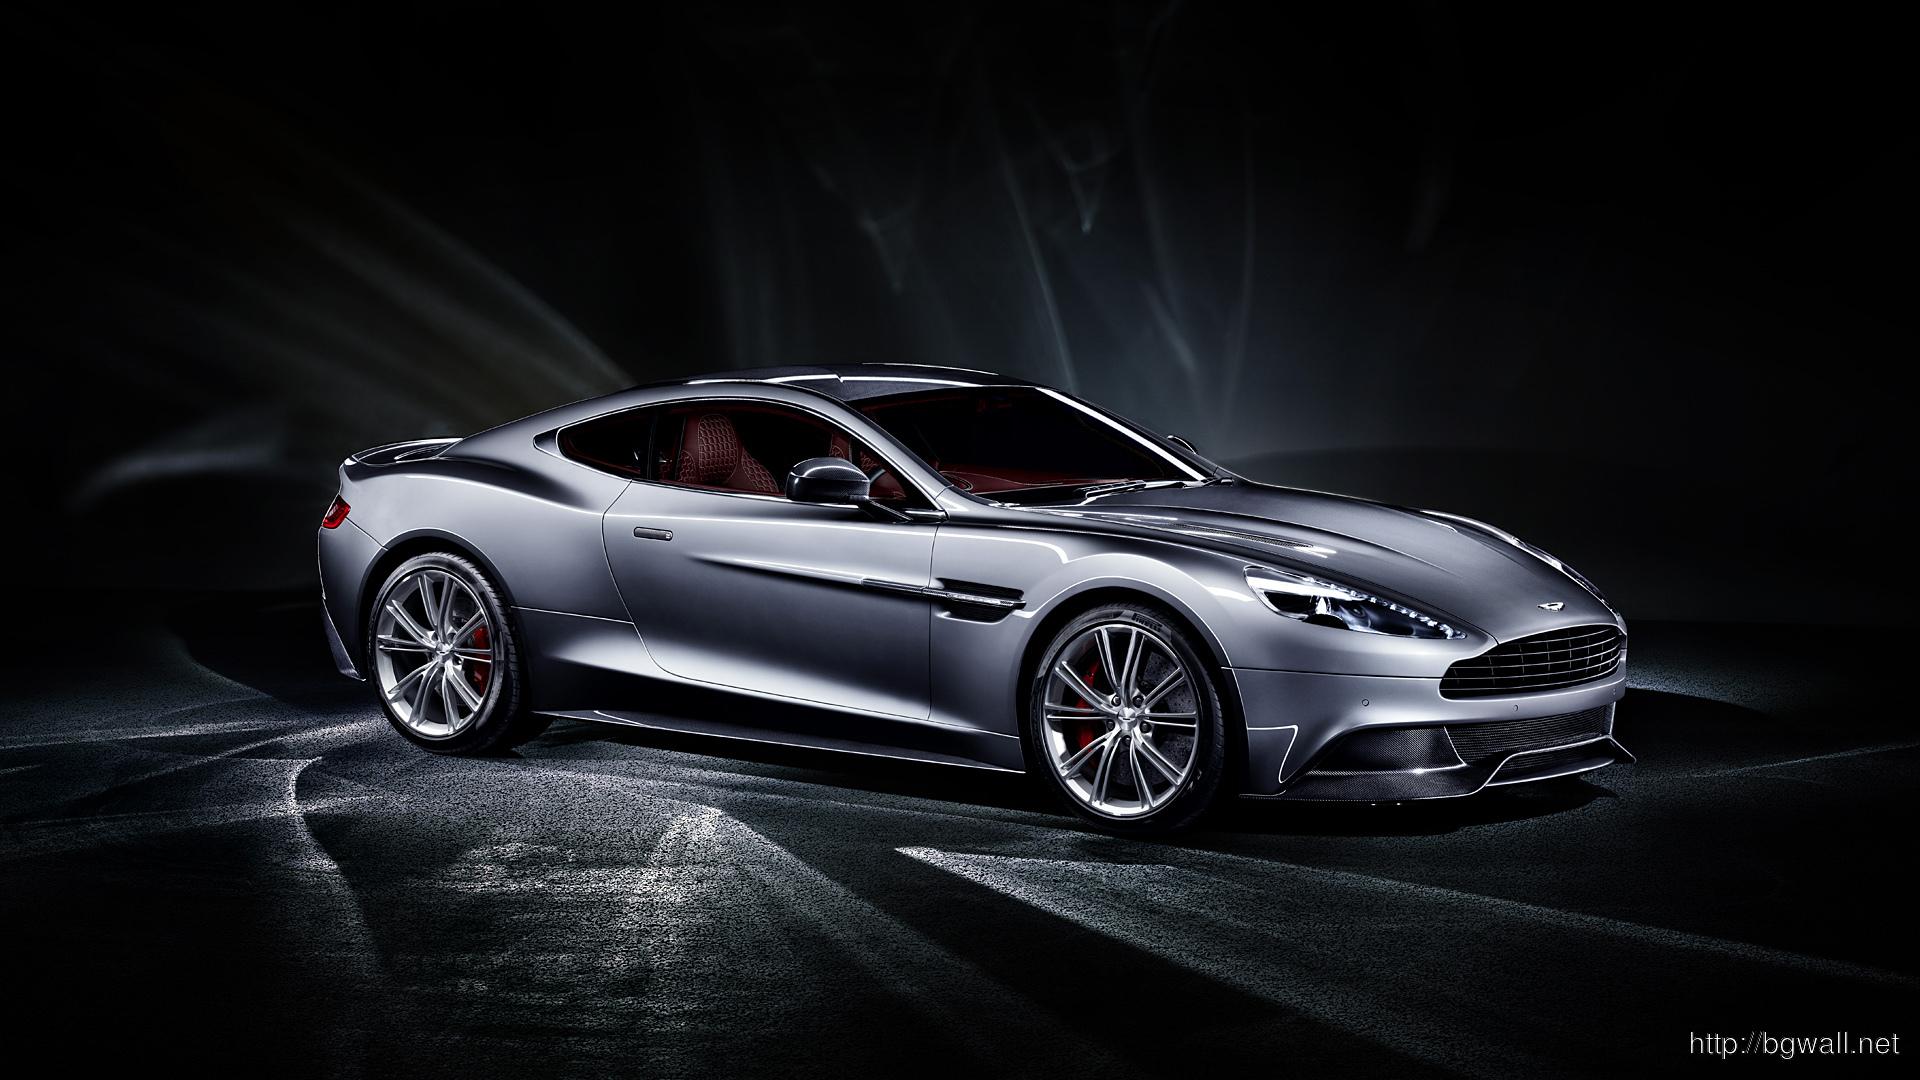 Aston Martin HD Wallpaper